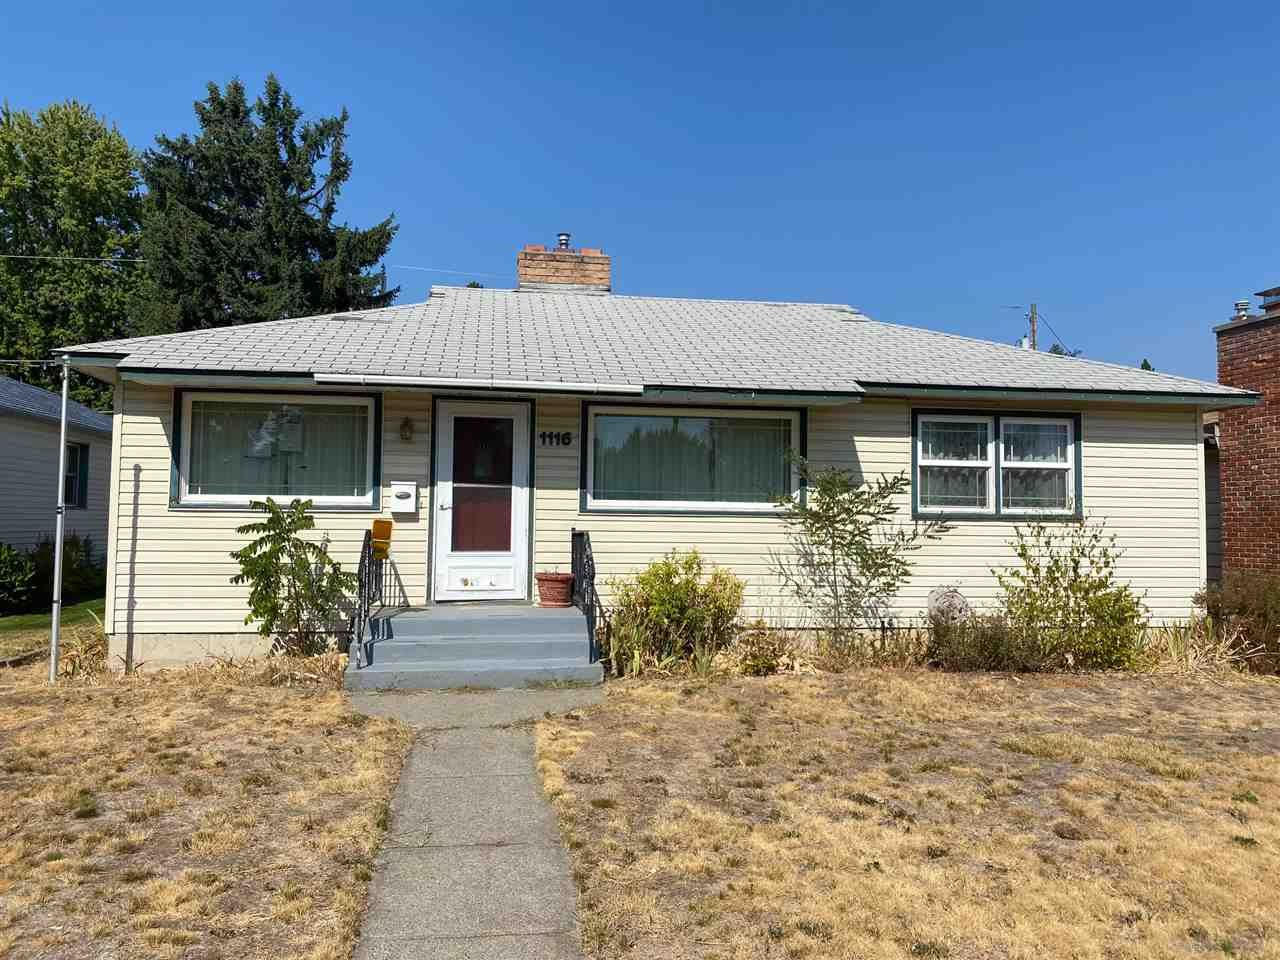 1116 W ROWAN Ave, Spokane, WA 99205 - #: 202023500